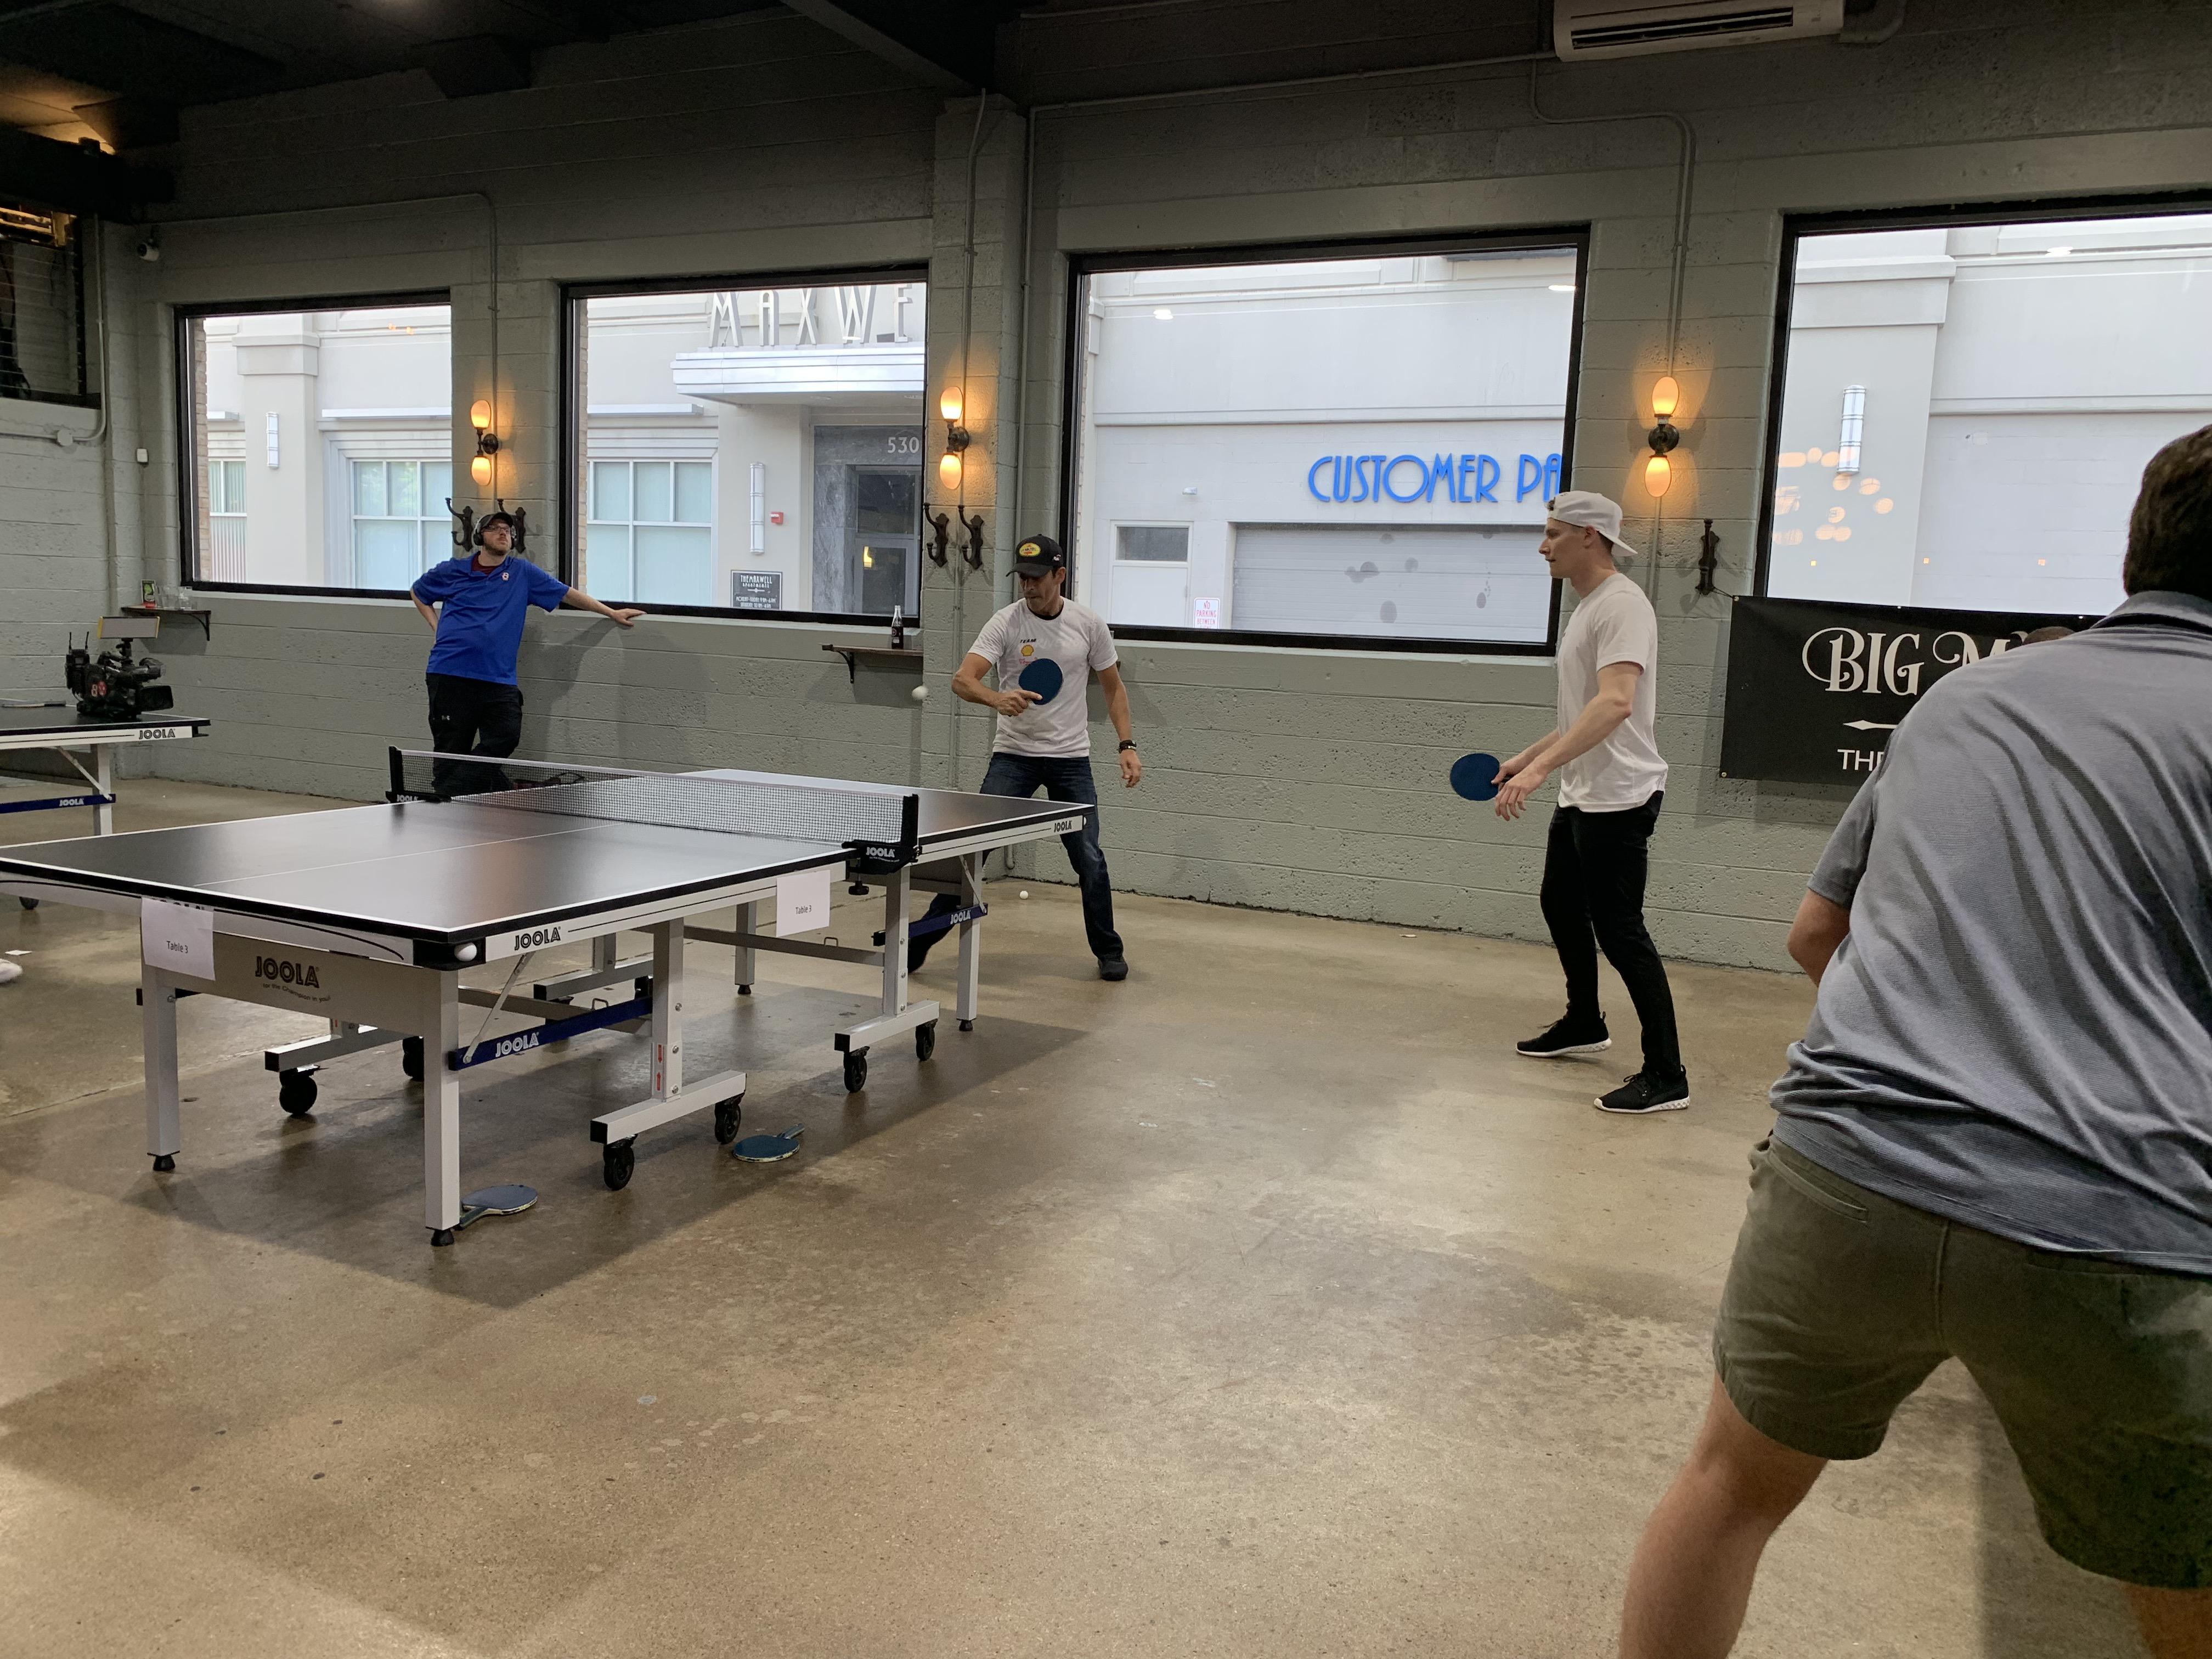 josef-newgarden-helio-castroneves-ping-pong